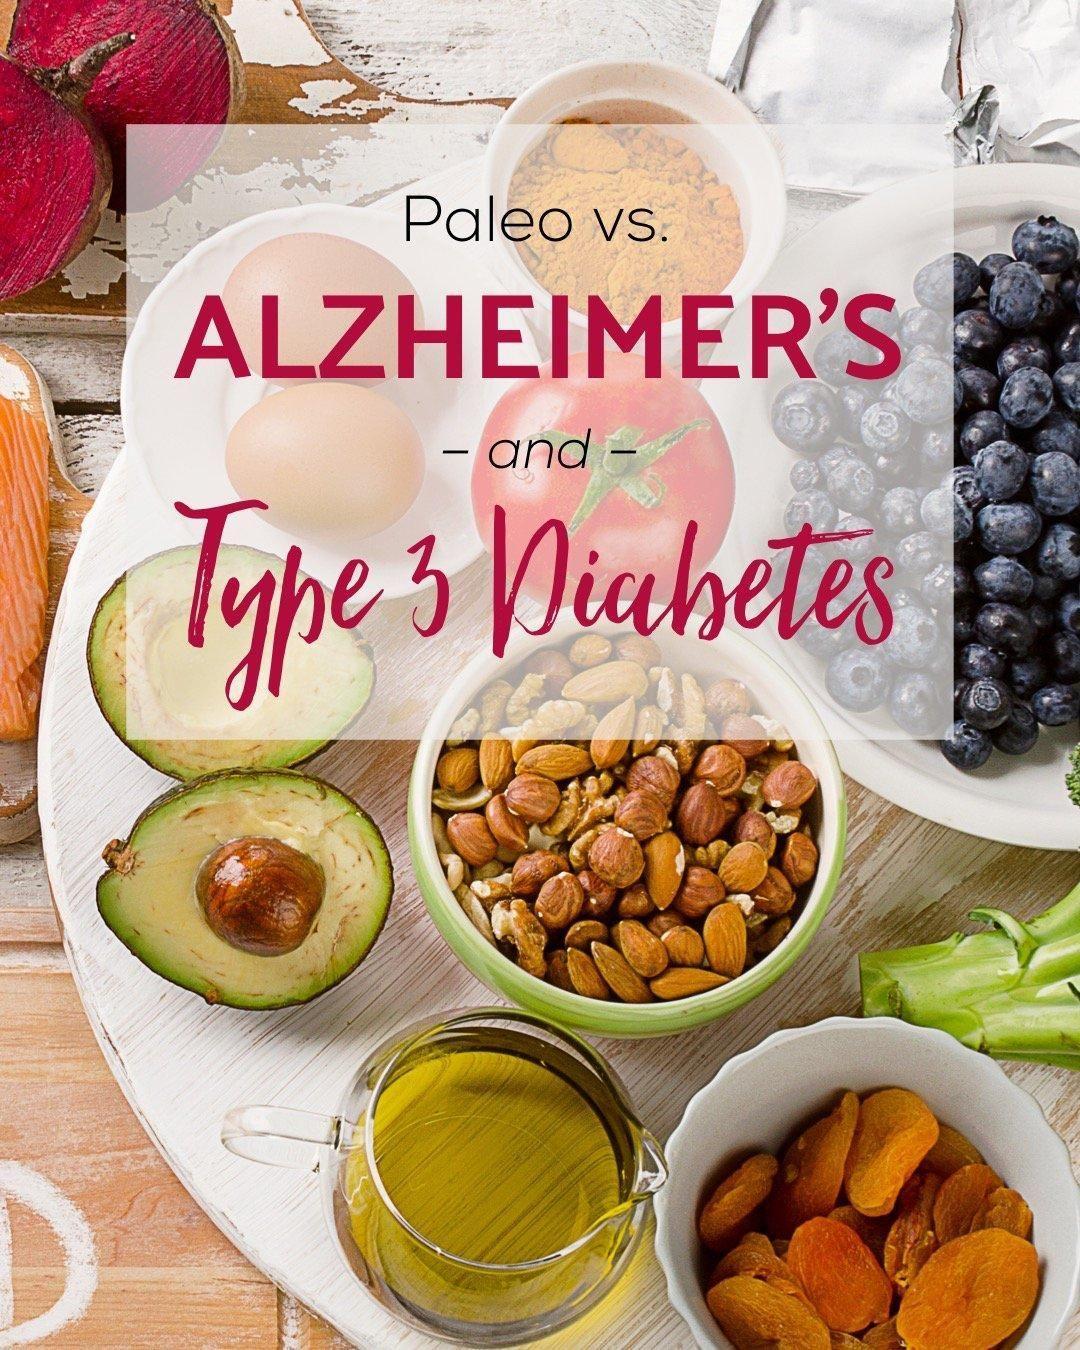 Paleo vs. Alzheimer's & Type 3 Diabetes